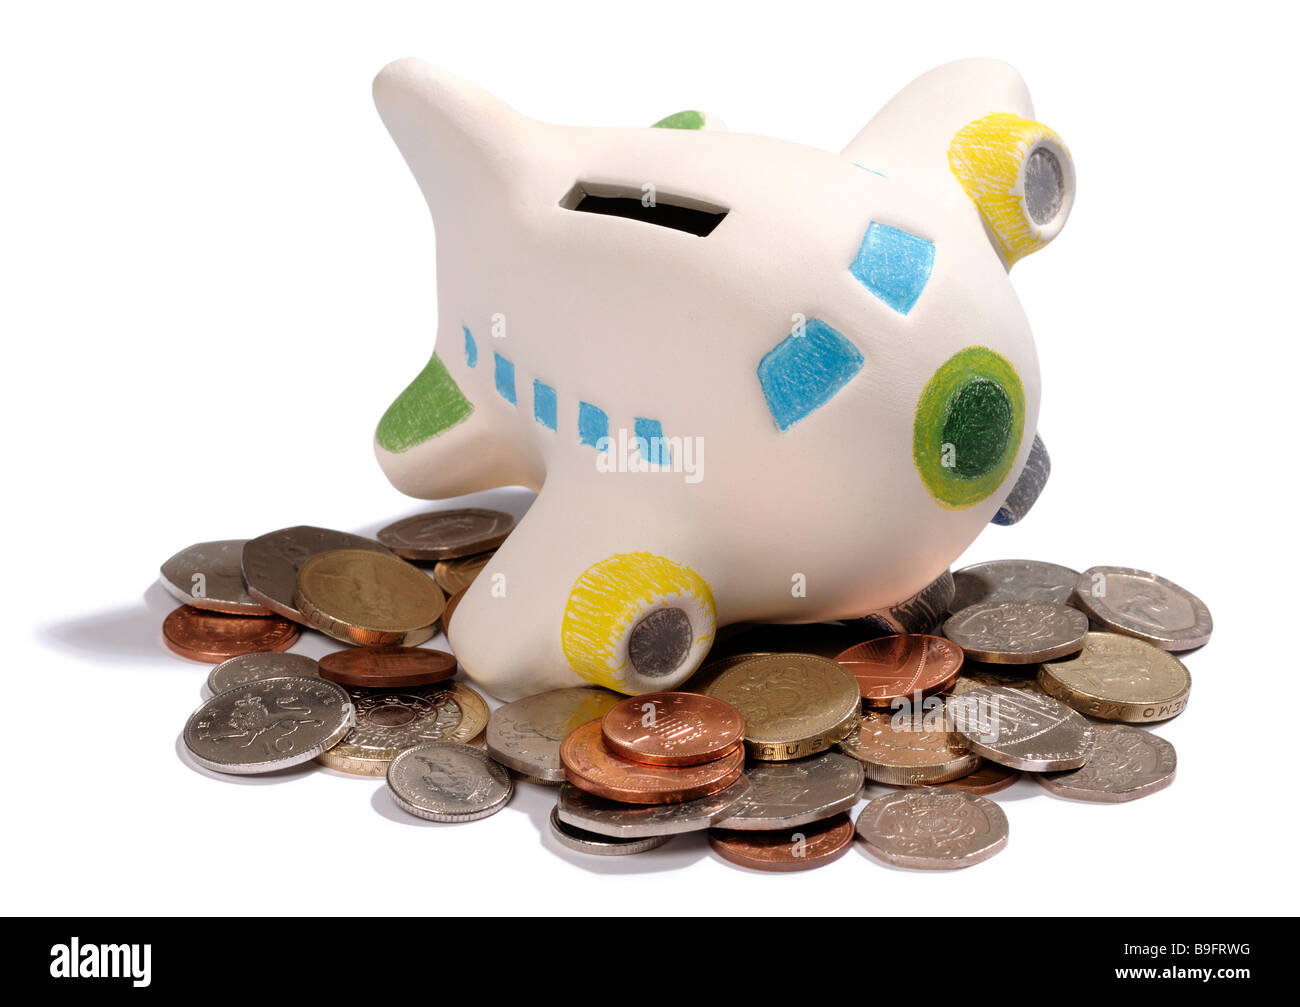 Aeroplane piggy bank - Stock Image